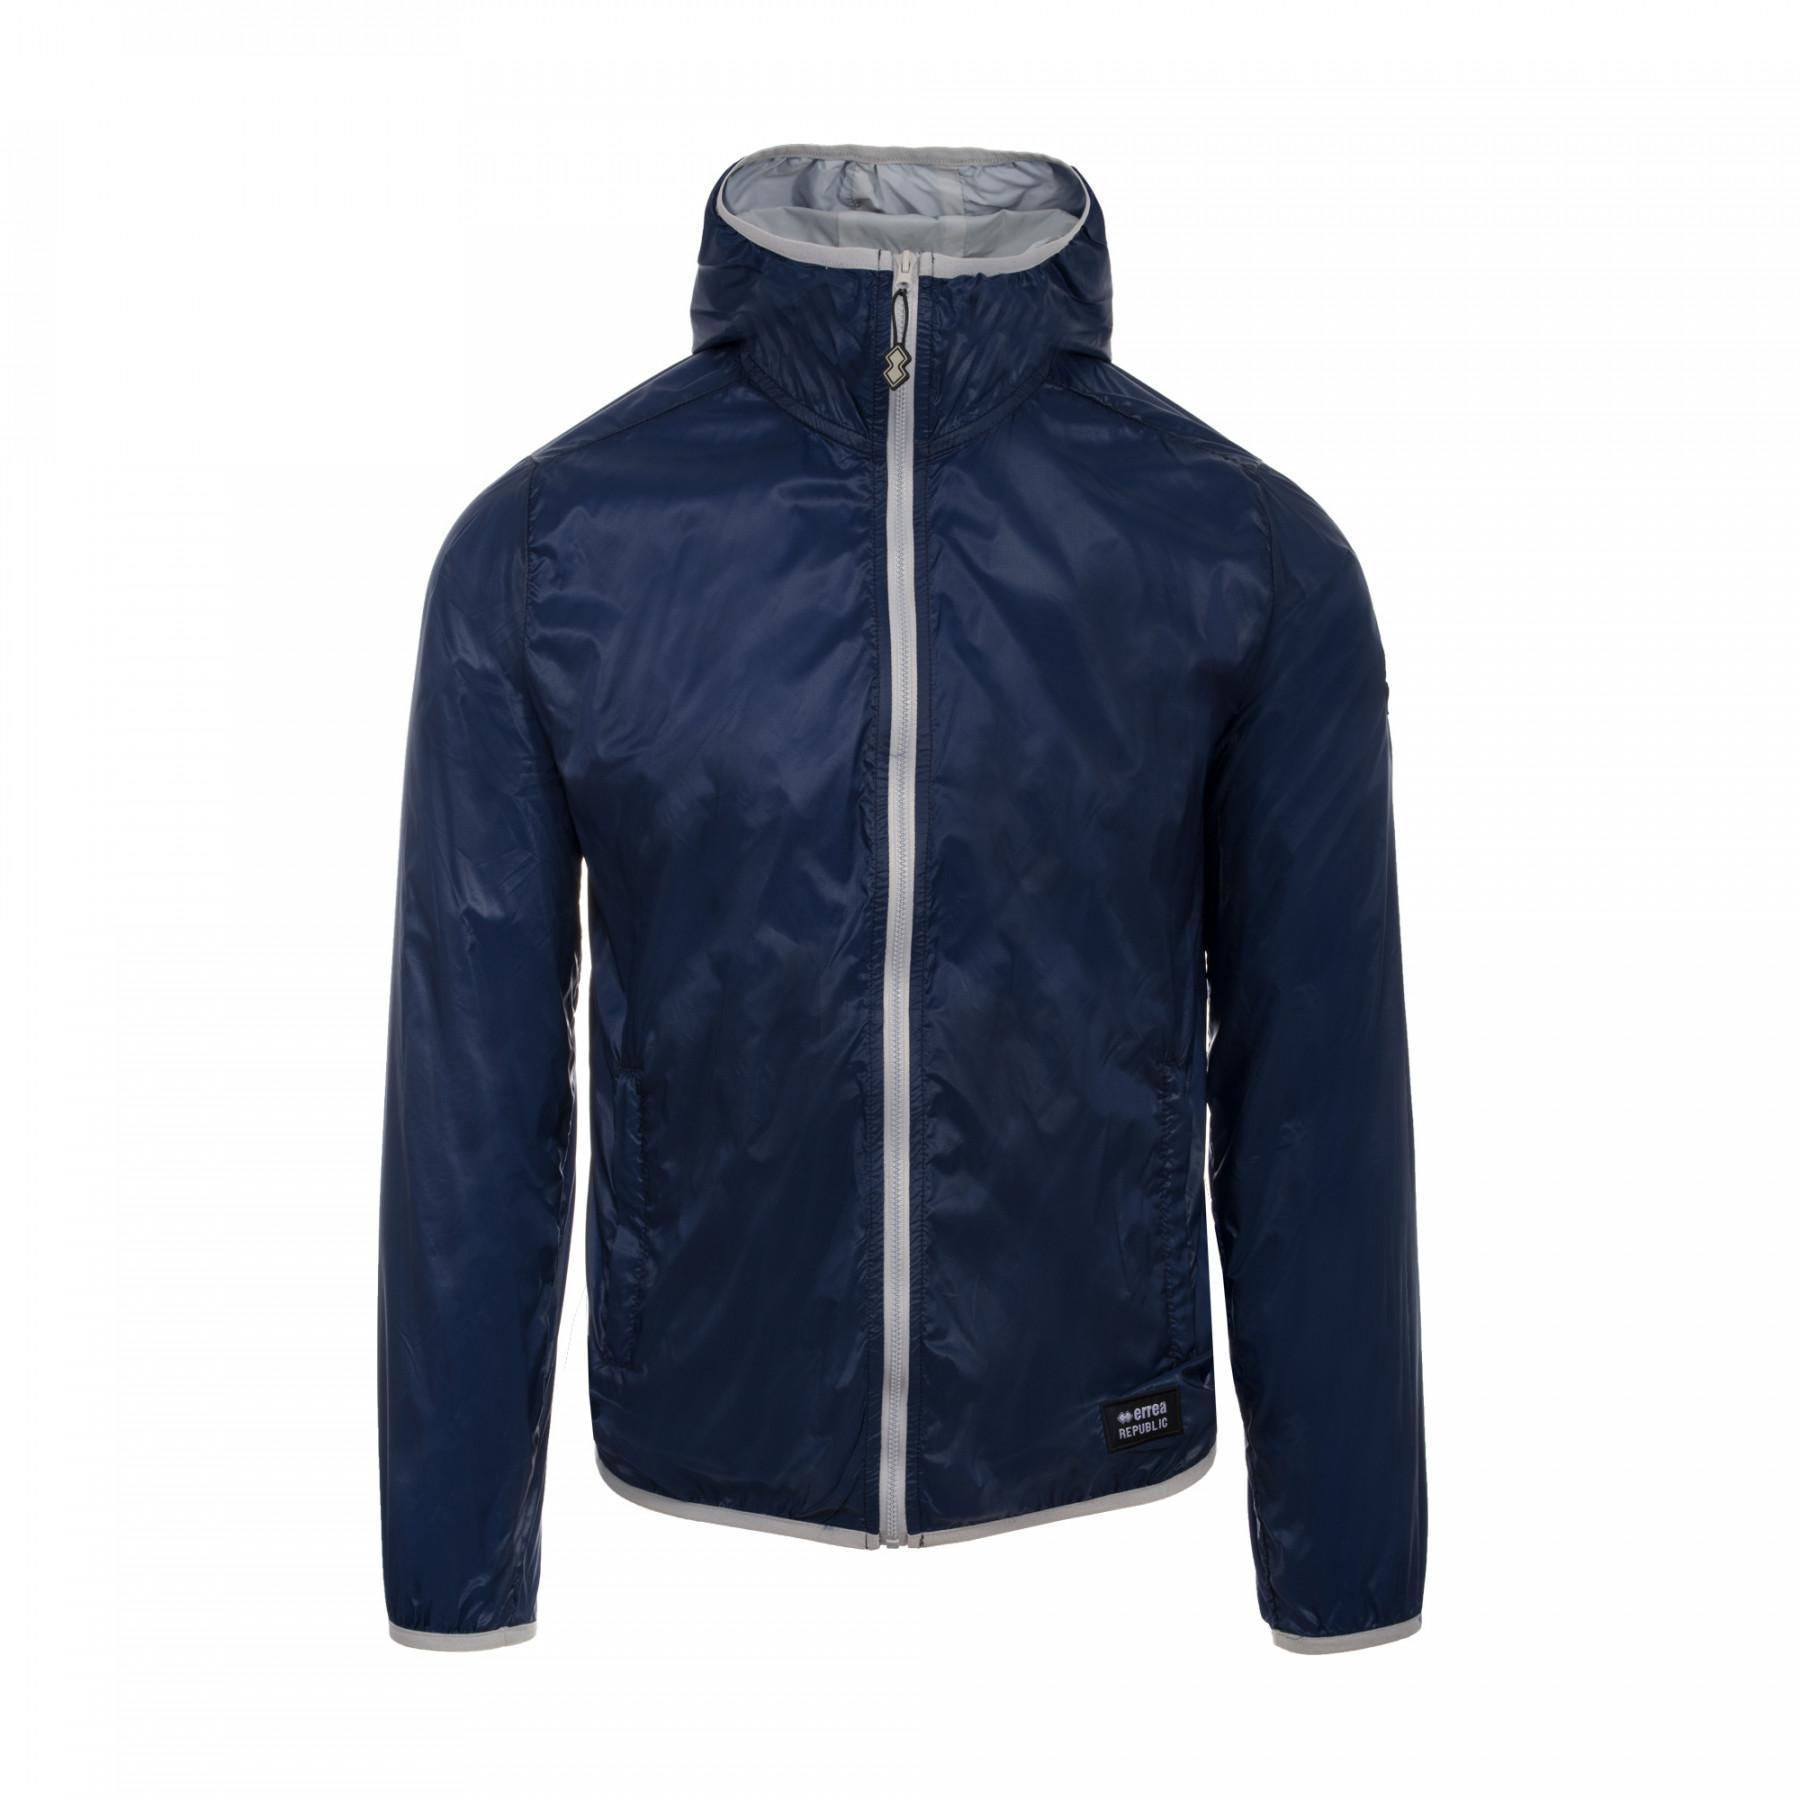 Errea ad jacket trend